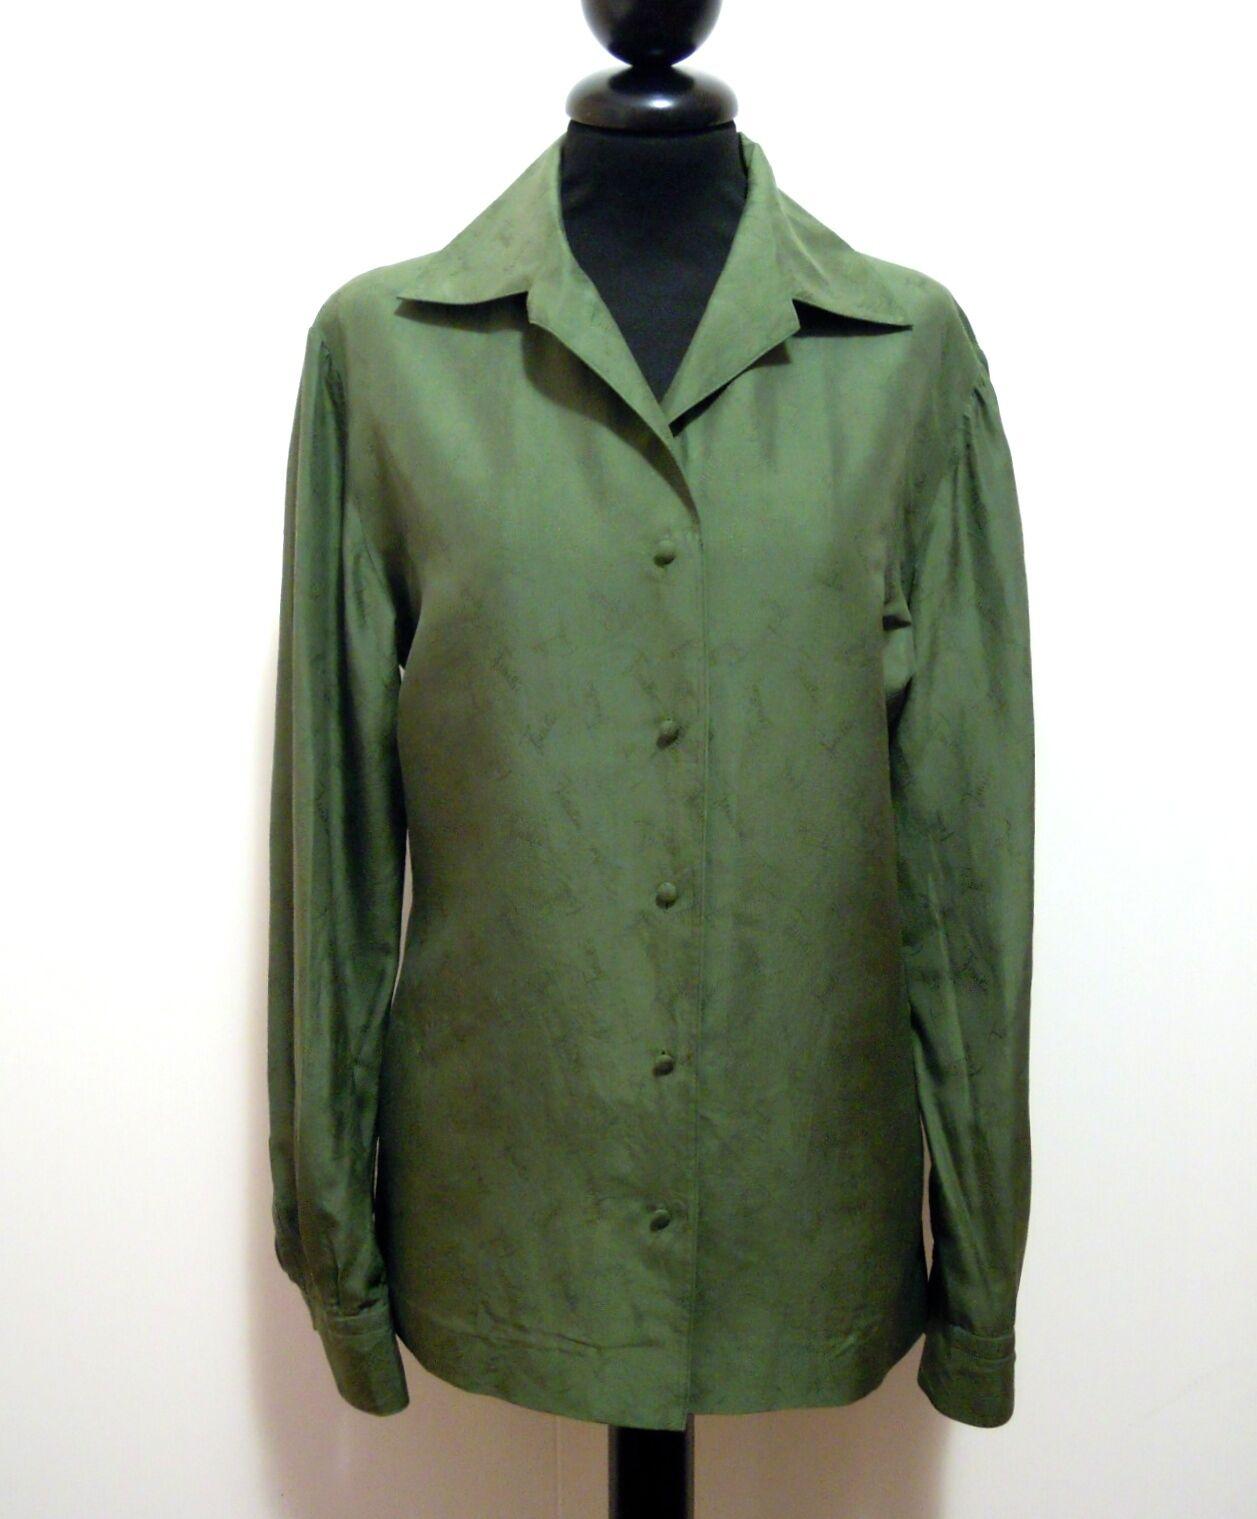 EMILIO PUCCI VINTAGE '60 Camicia damen Seta Silk Woman Shirt Sz.M - 44